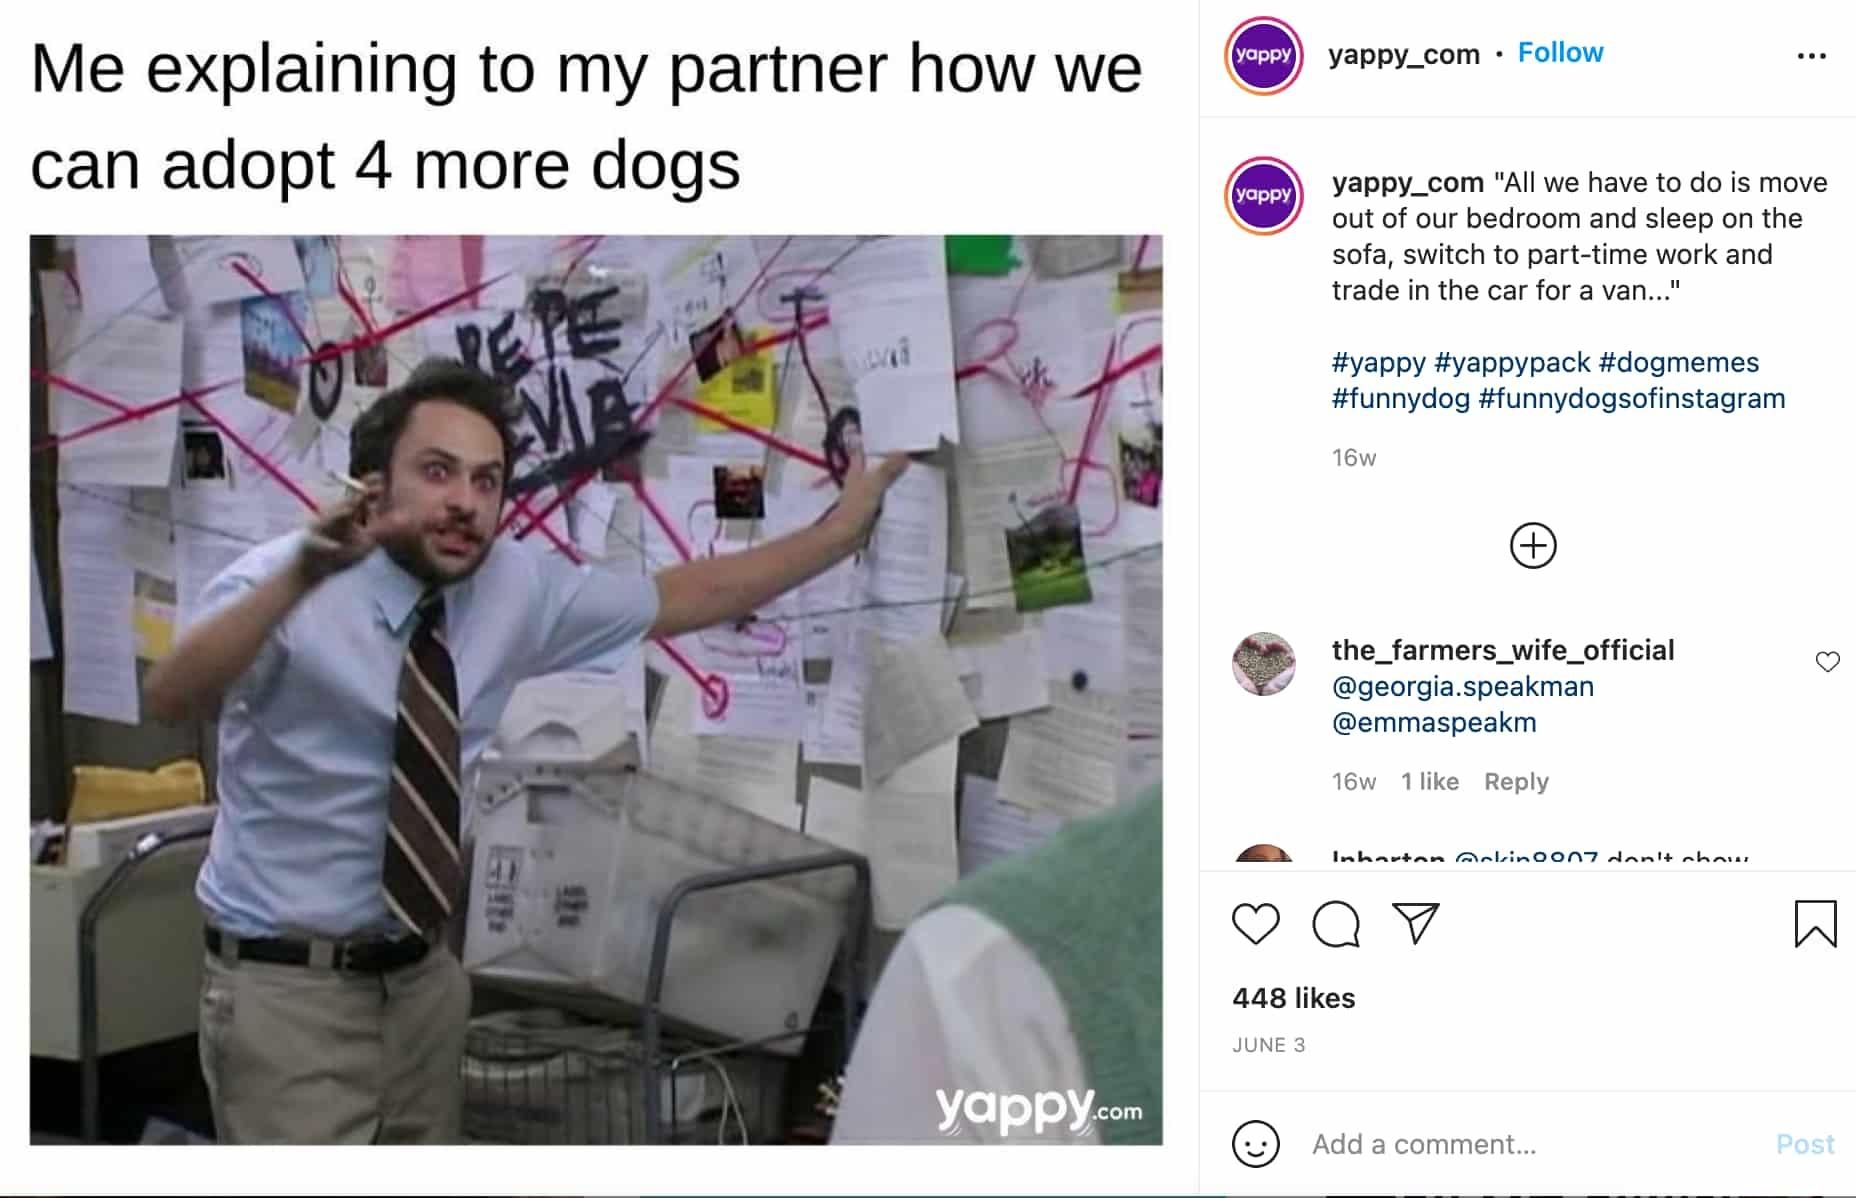 meme marketing example by Yappy